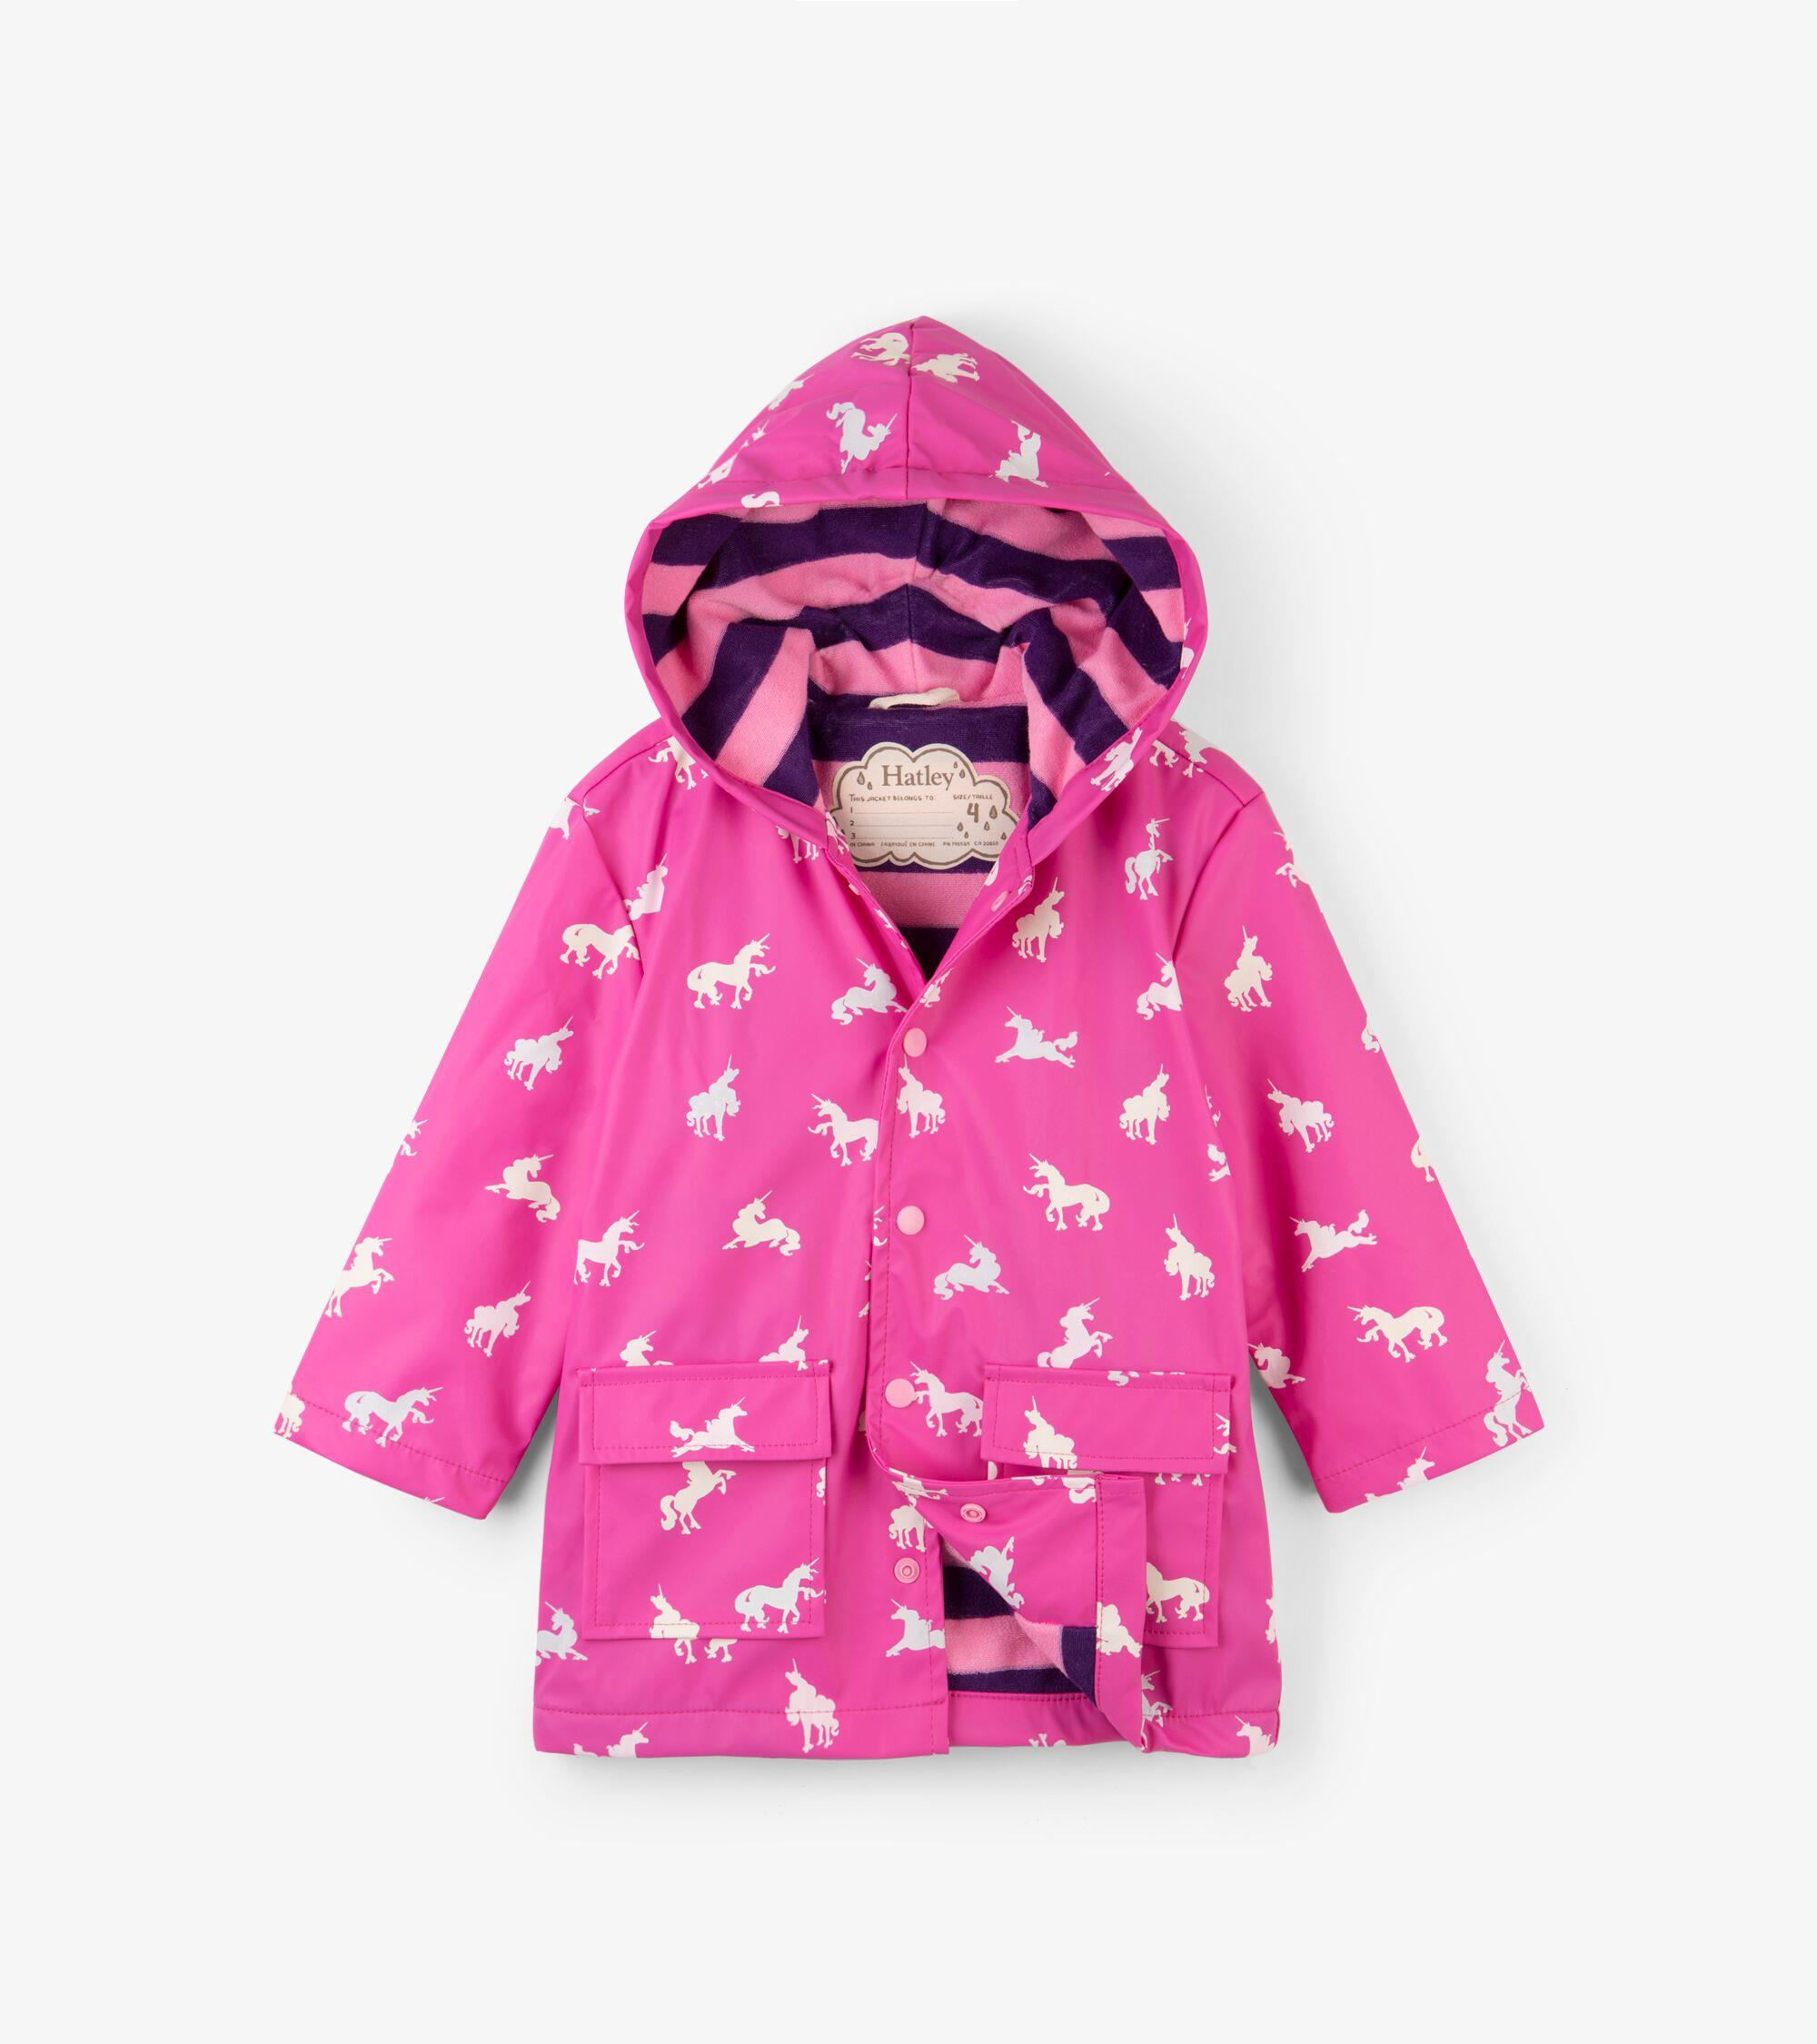 68e1130b32111 Hatley Colour Changing Unicorn Silhouettes Raincoat - Catfish Kids